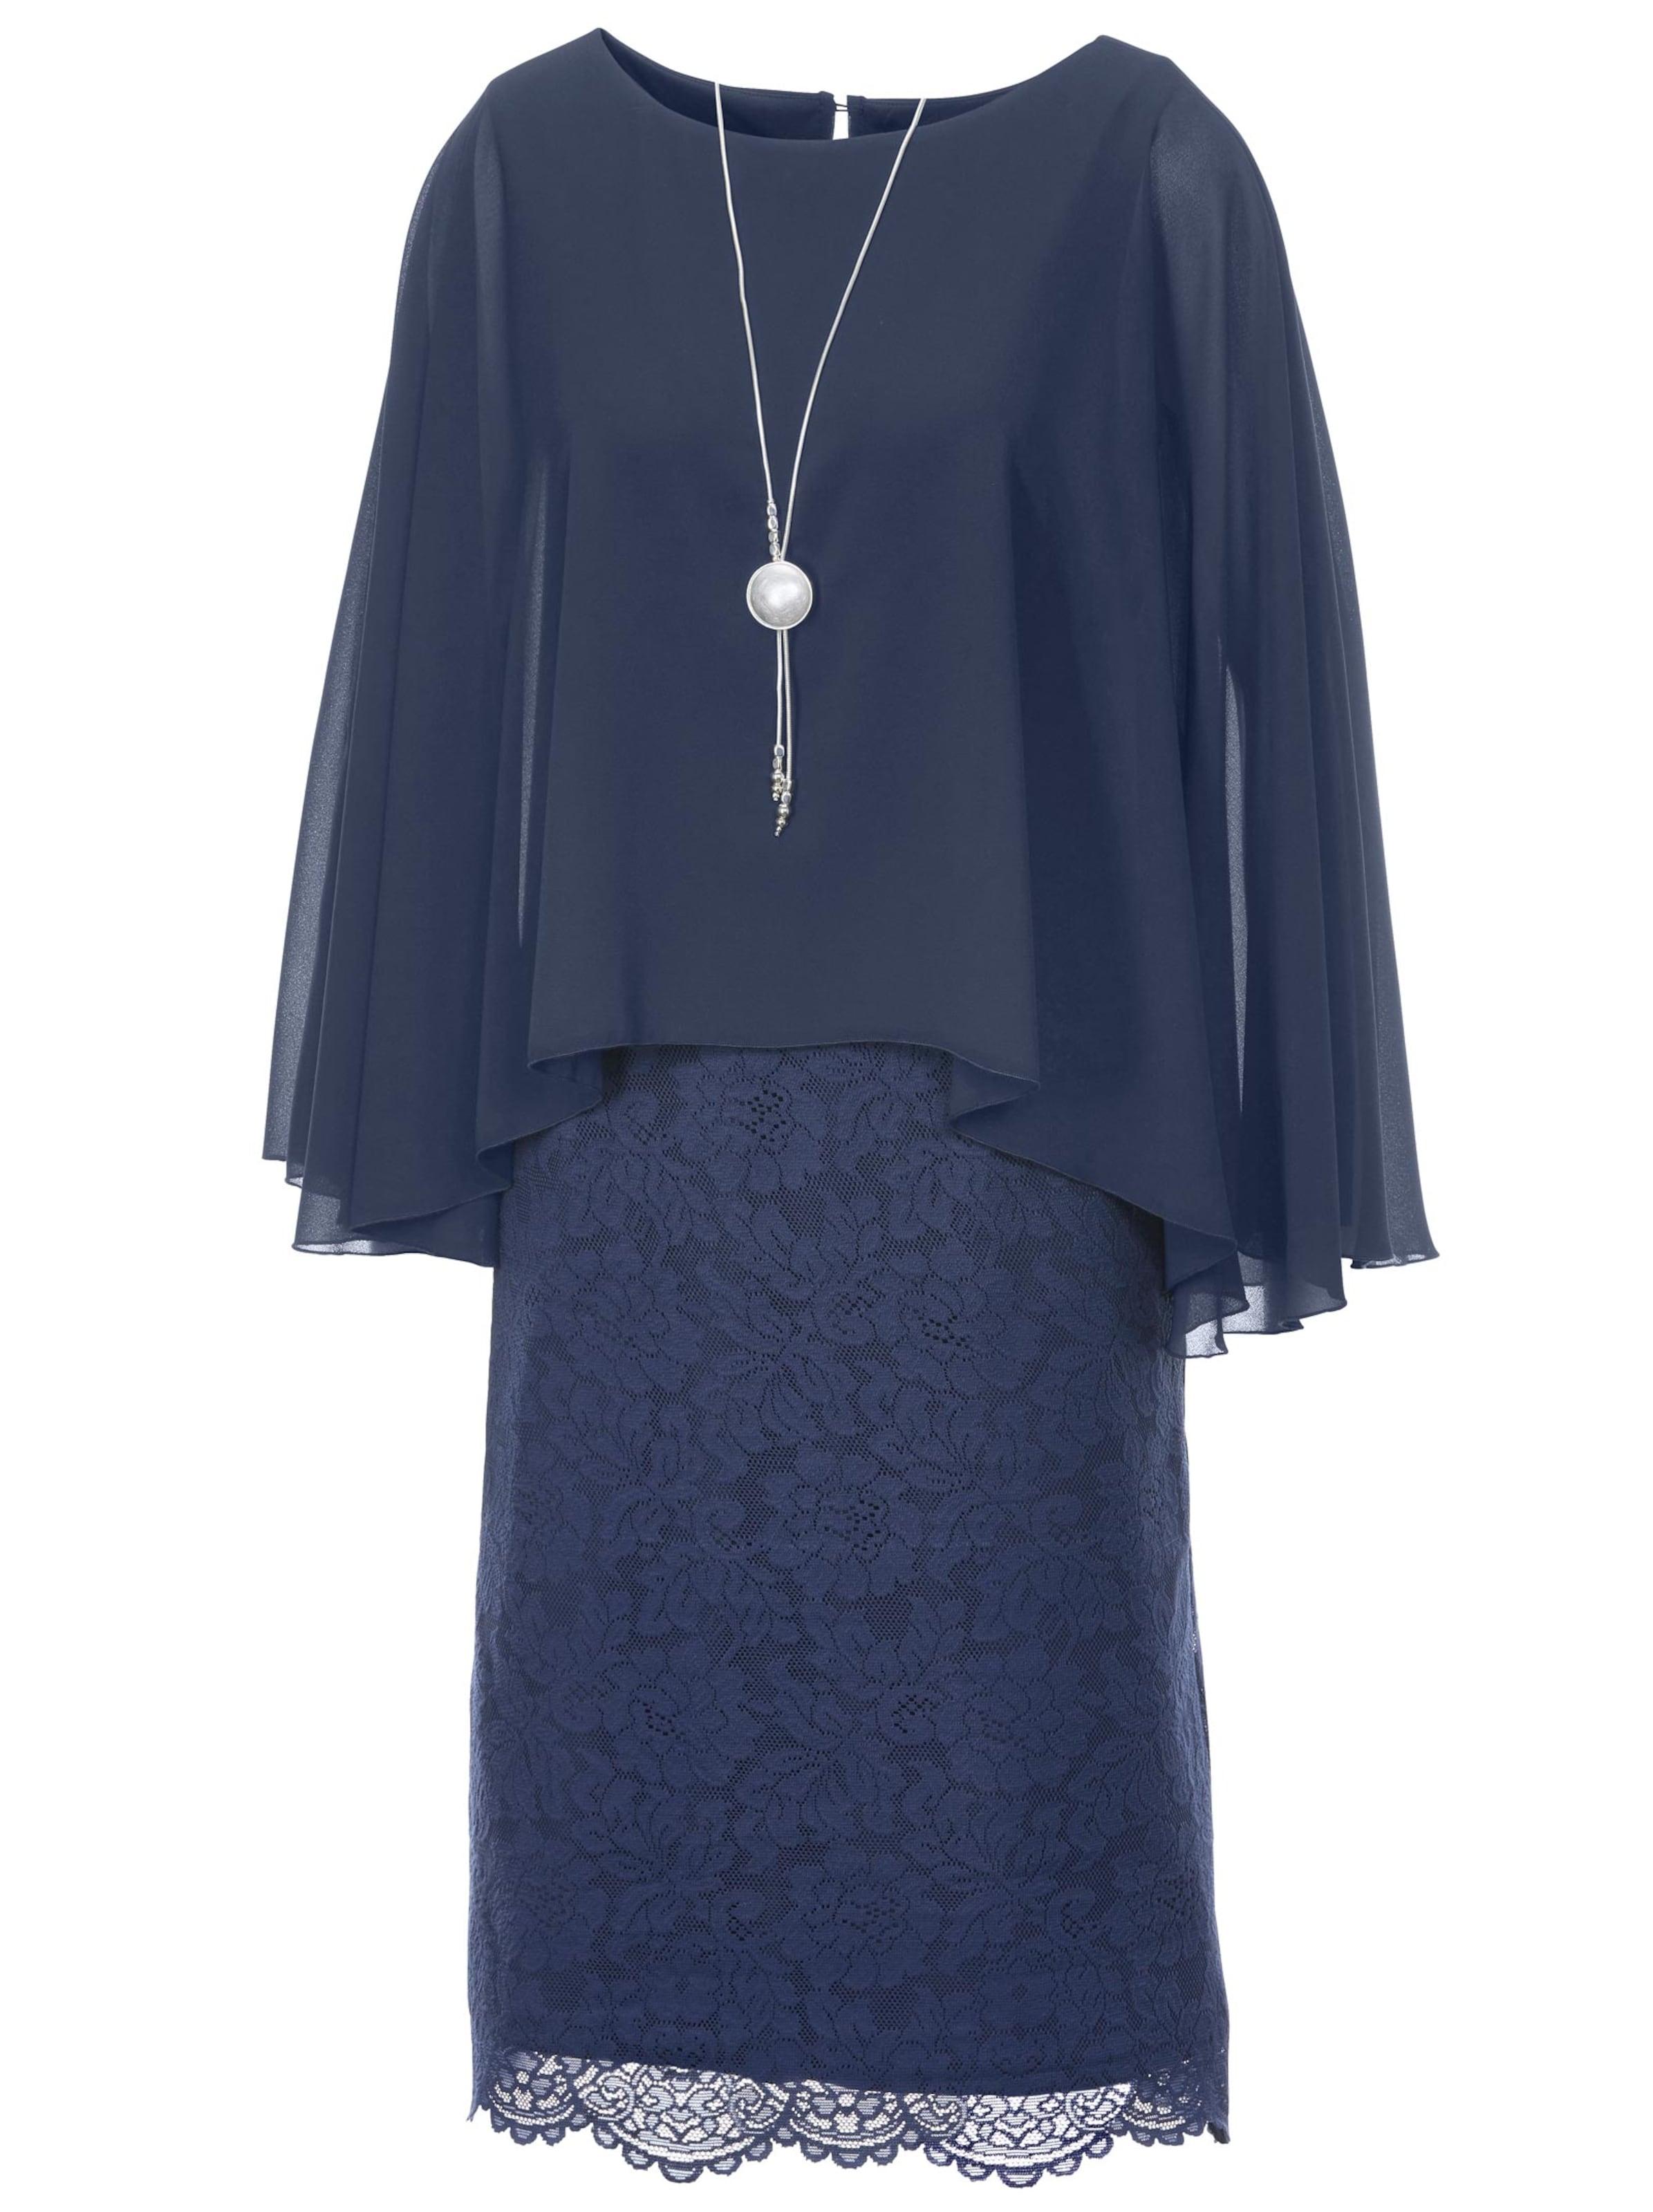 witt weiden - Damen Kleid royalblau